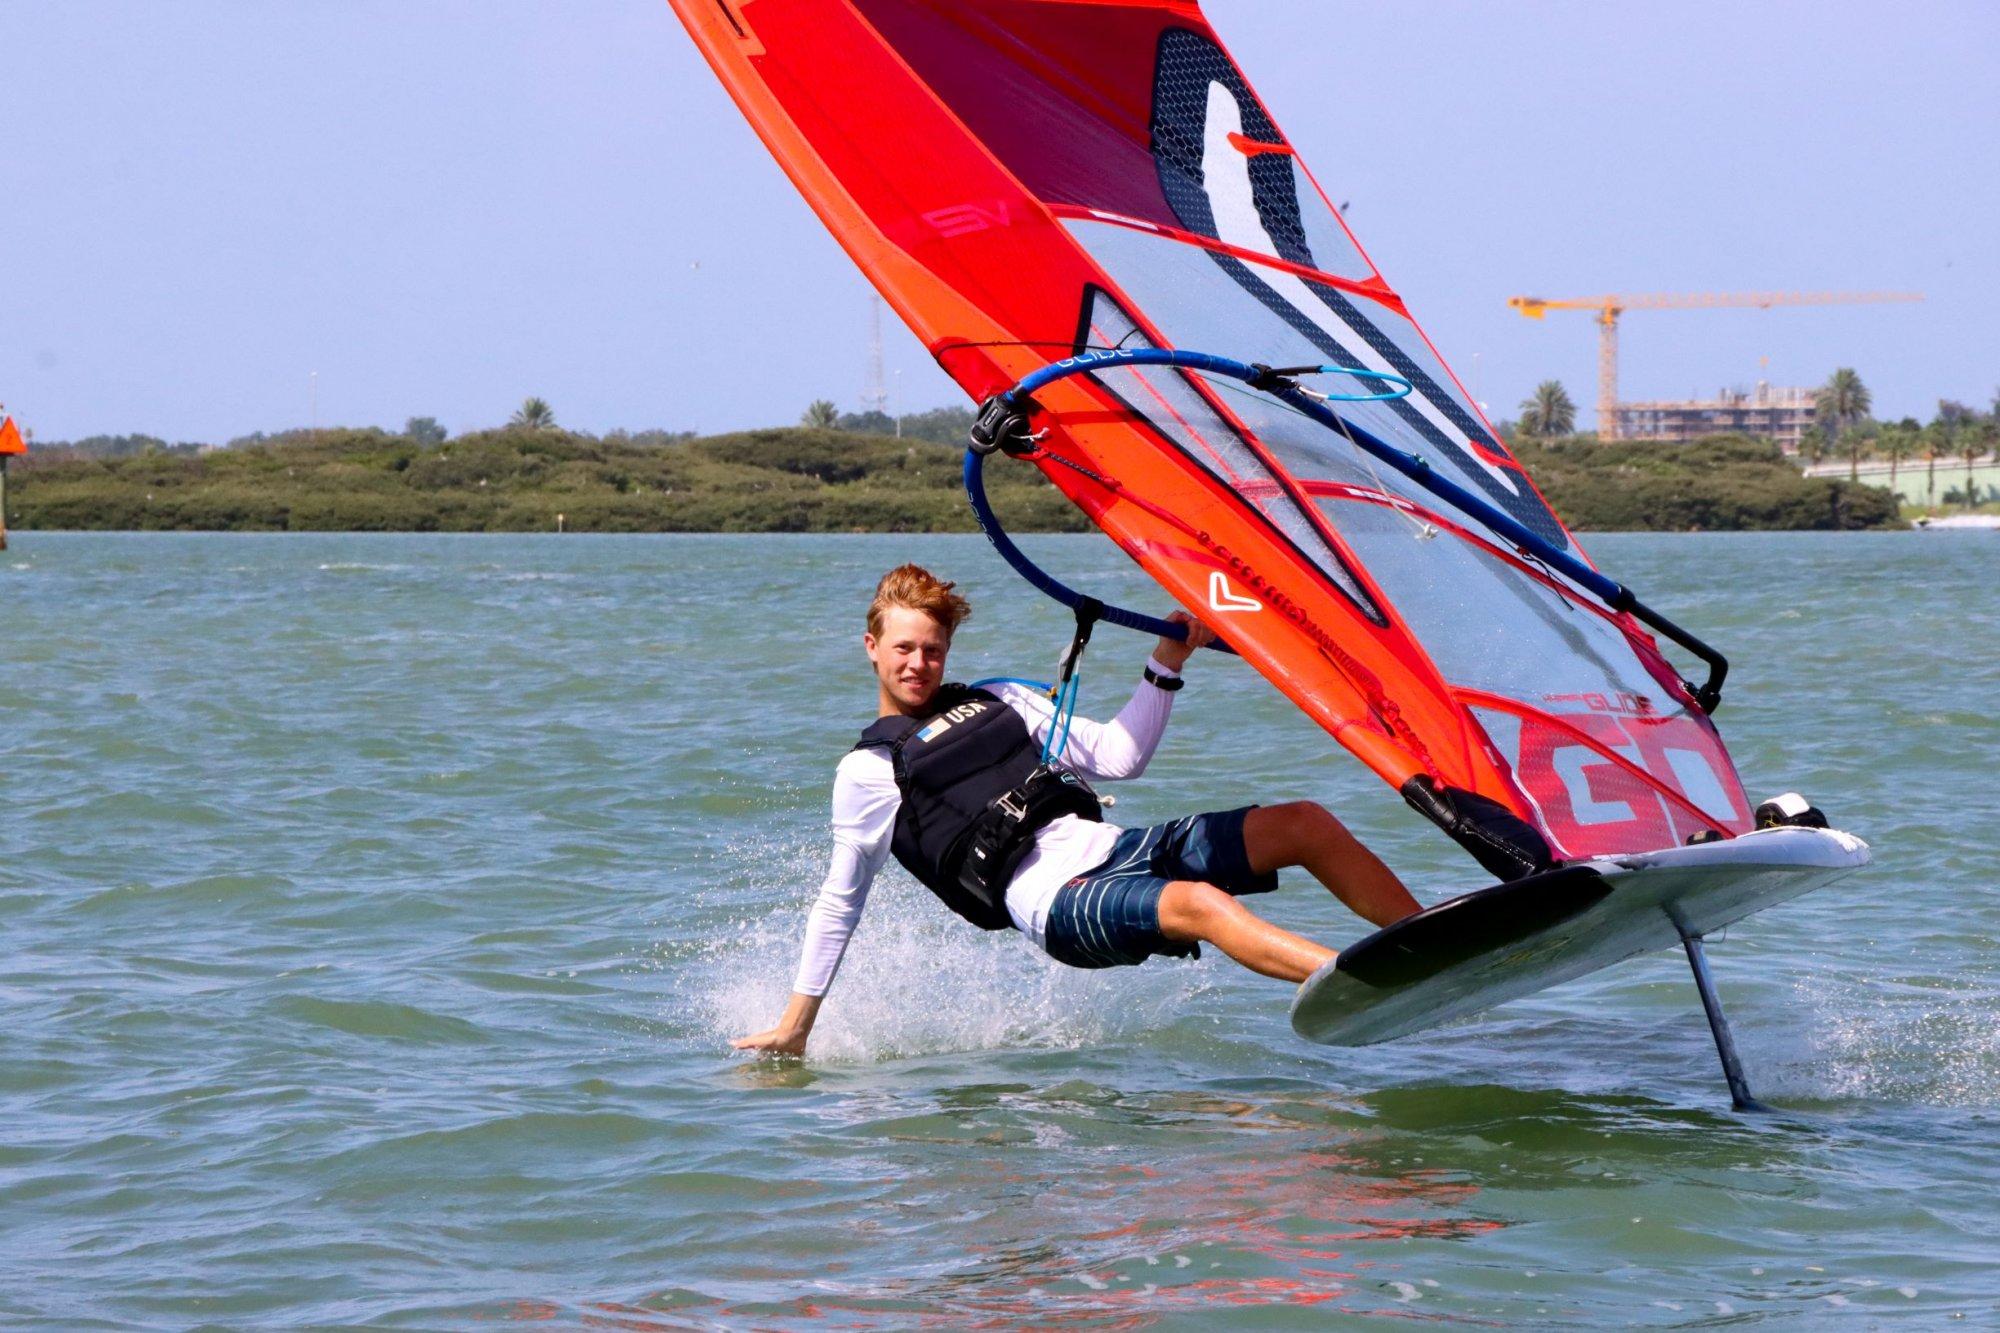 windsurf foil lessons